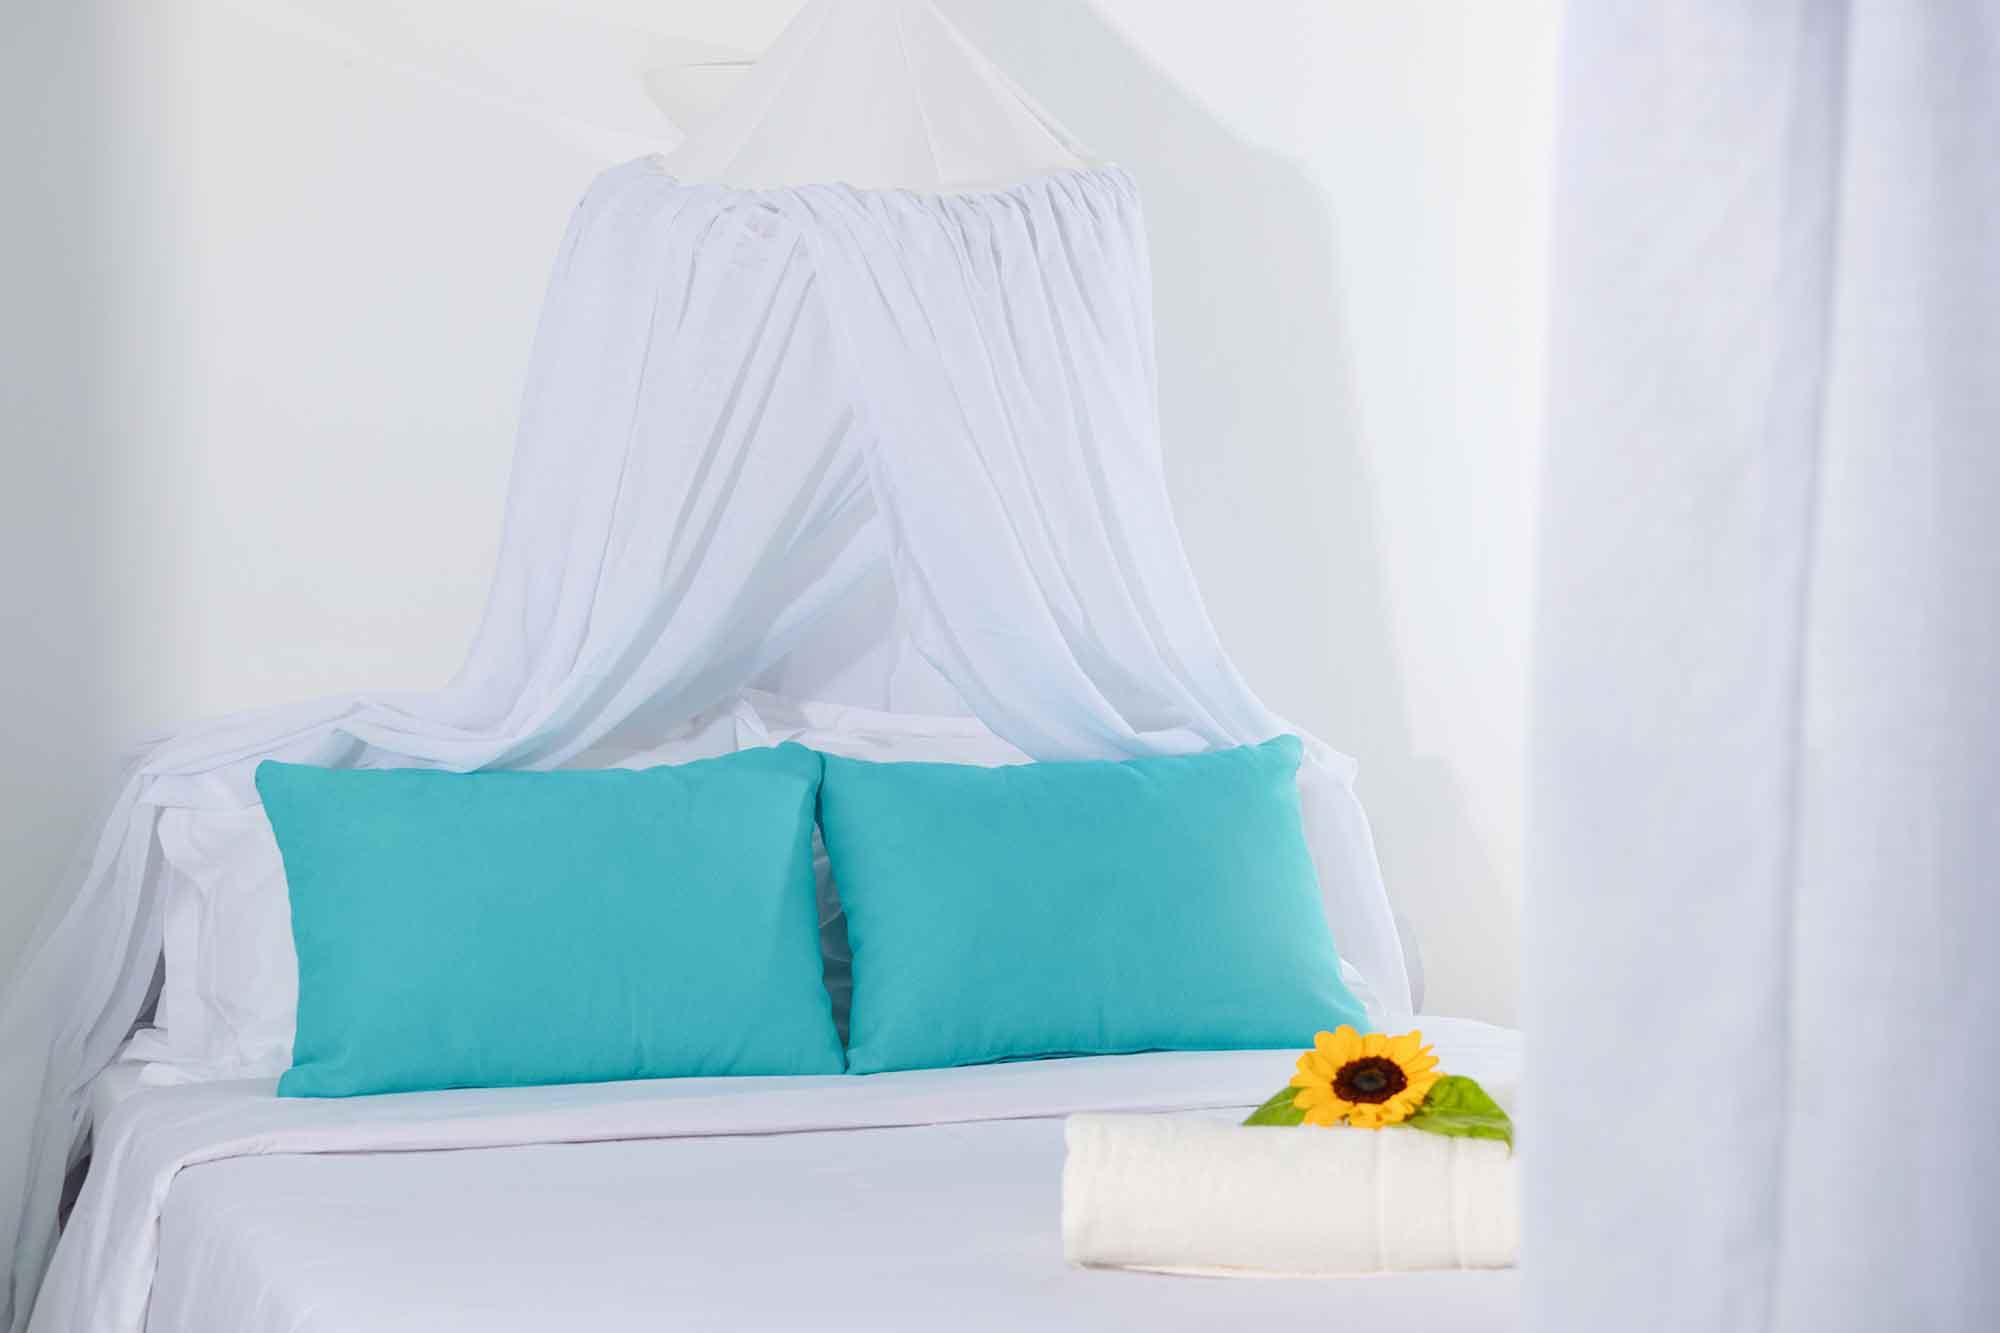 RENT A LUXURIOUS VILLA BY THE SEA IN MYKONOS - VILLA KARKOS - bedroom